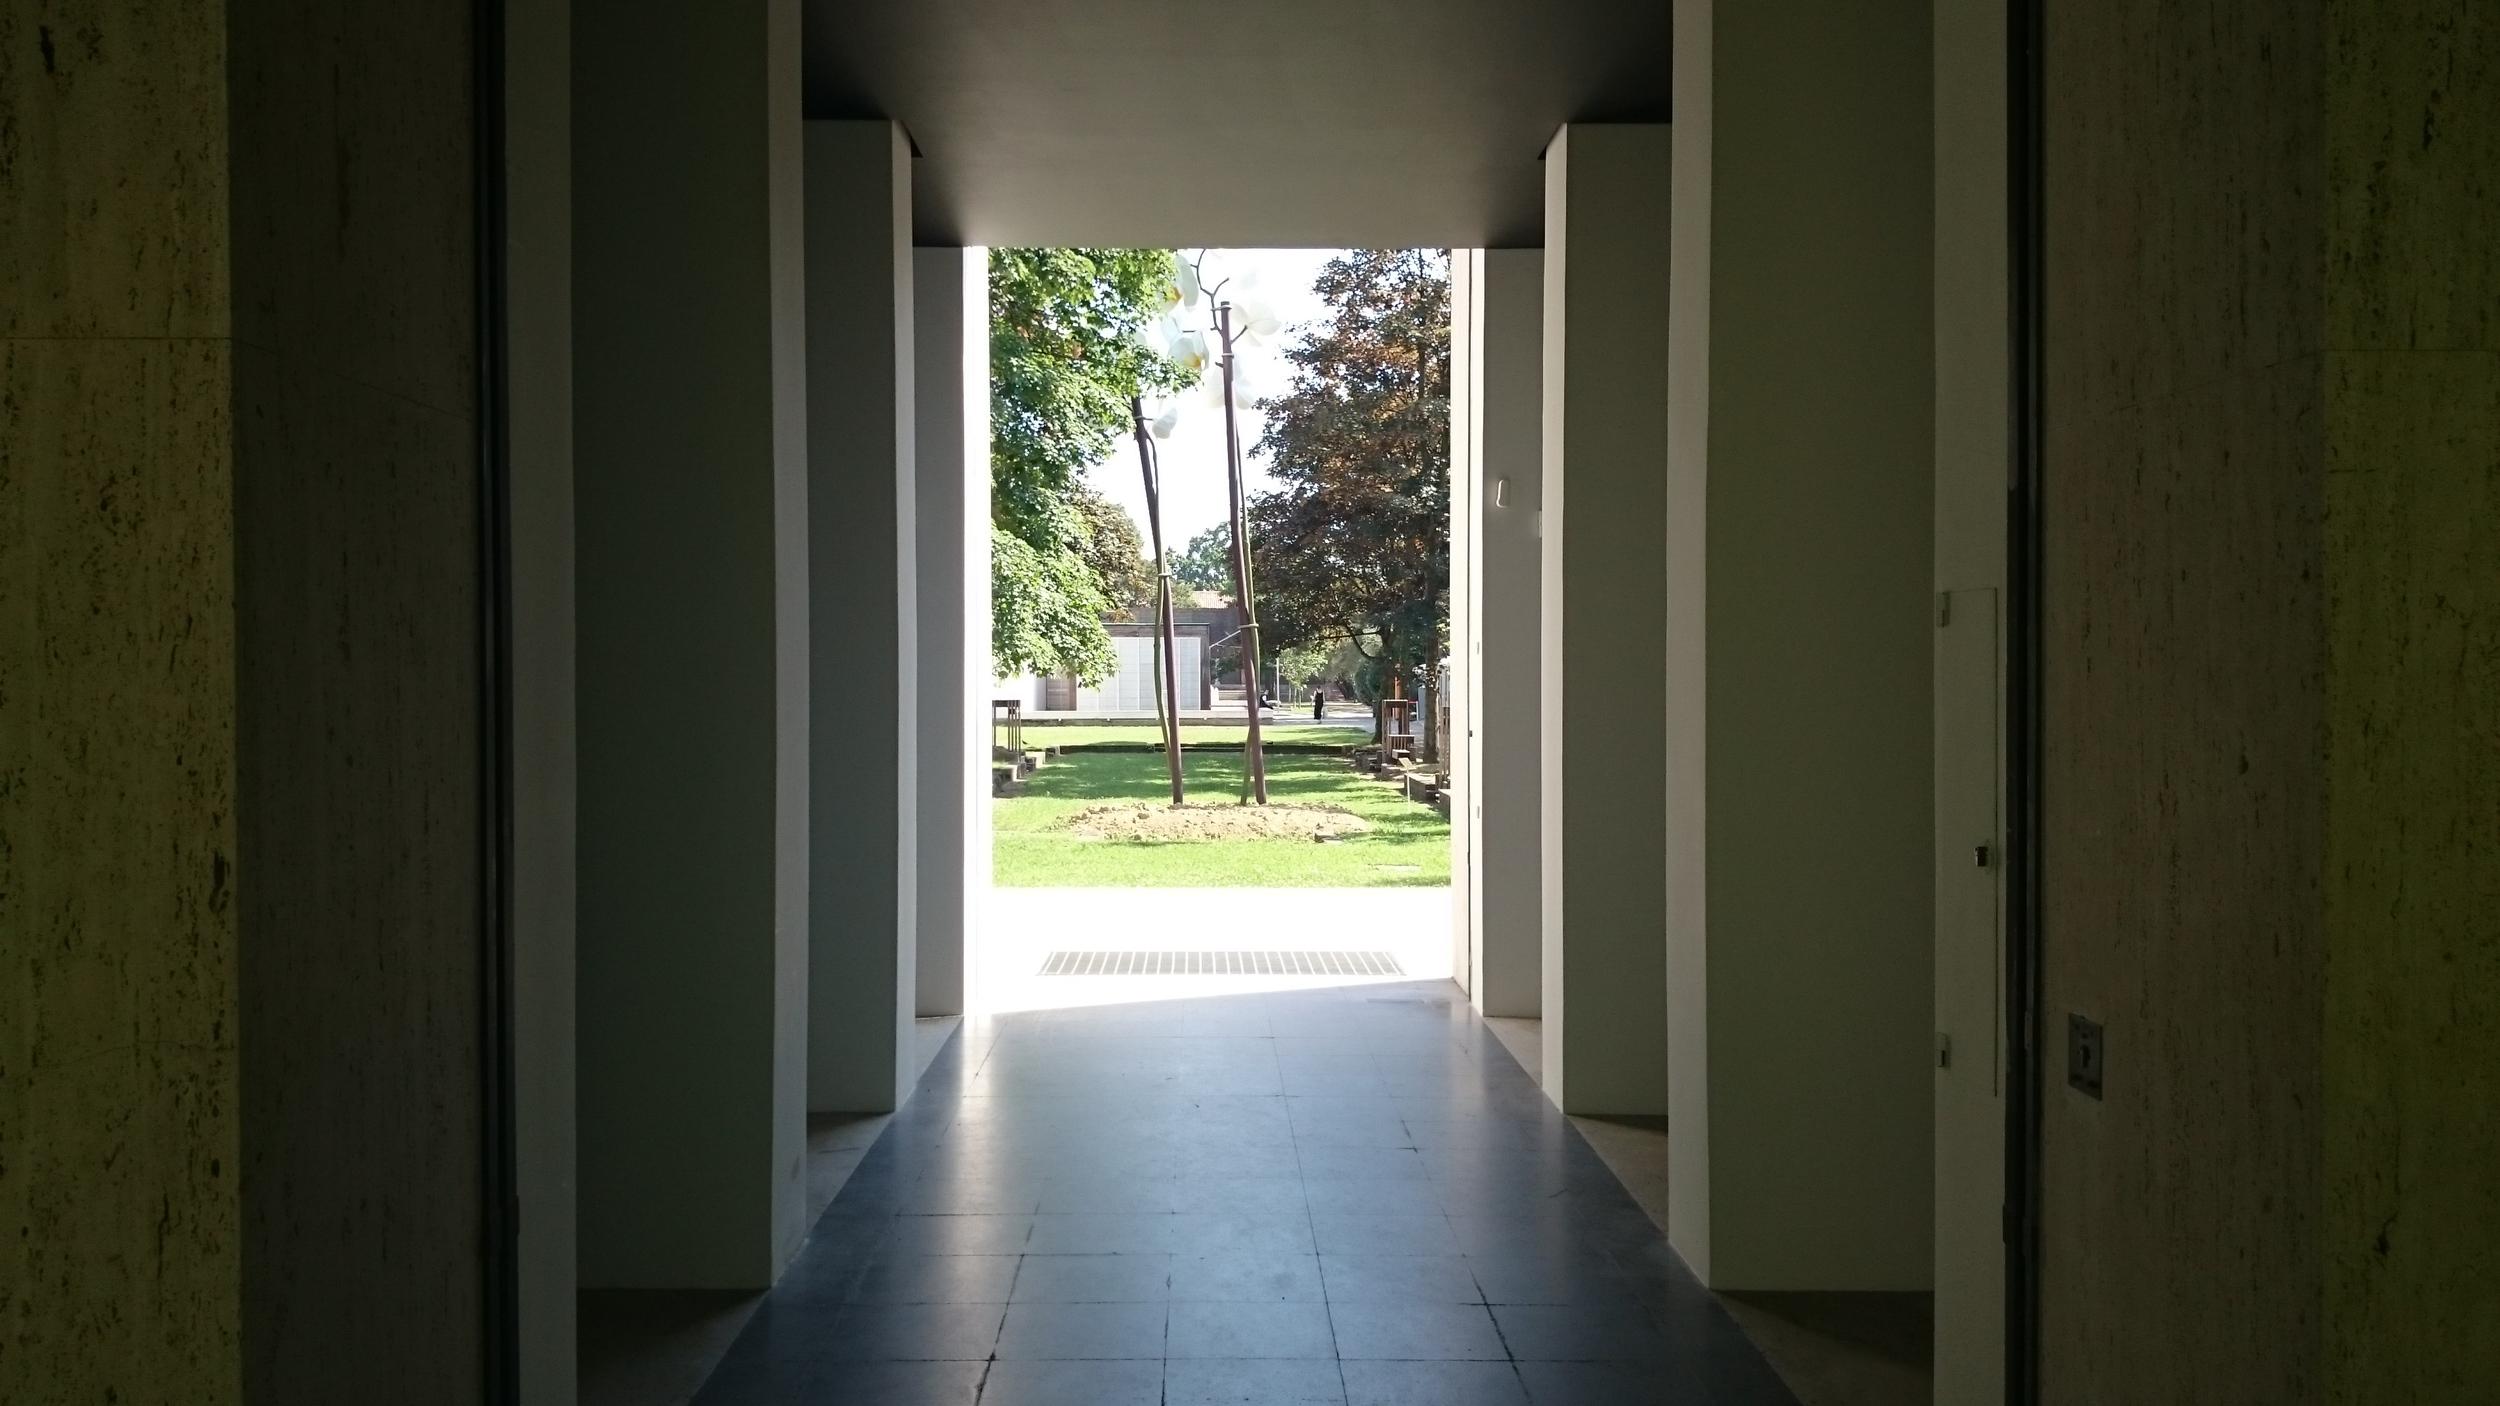 Framing a courtyard